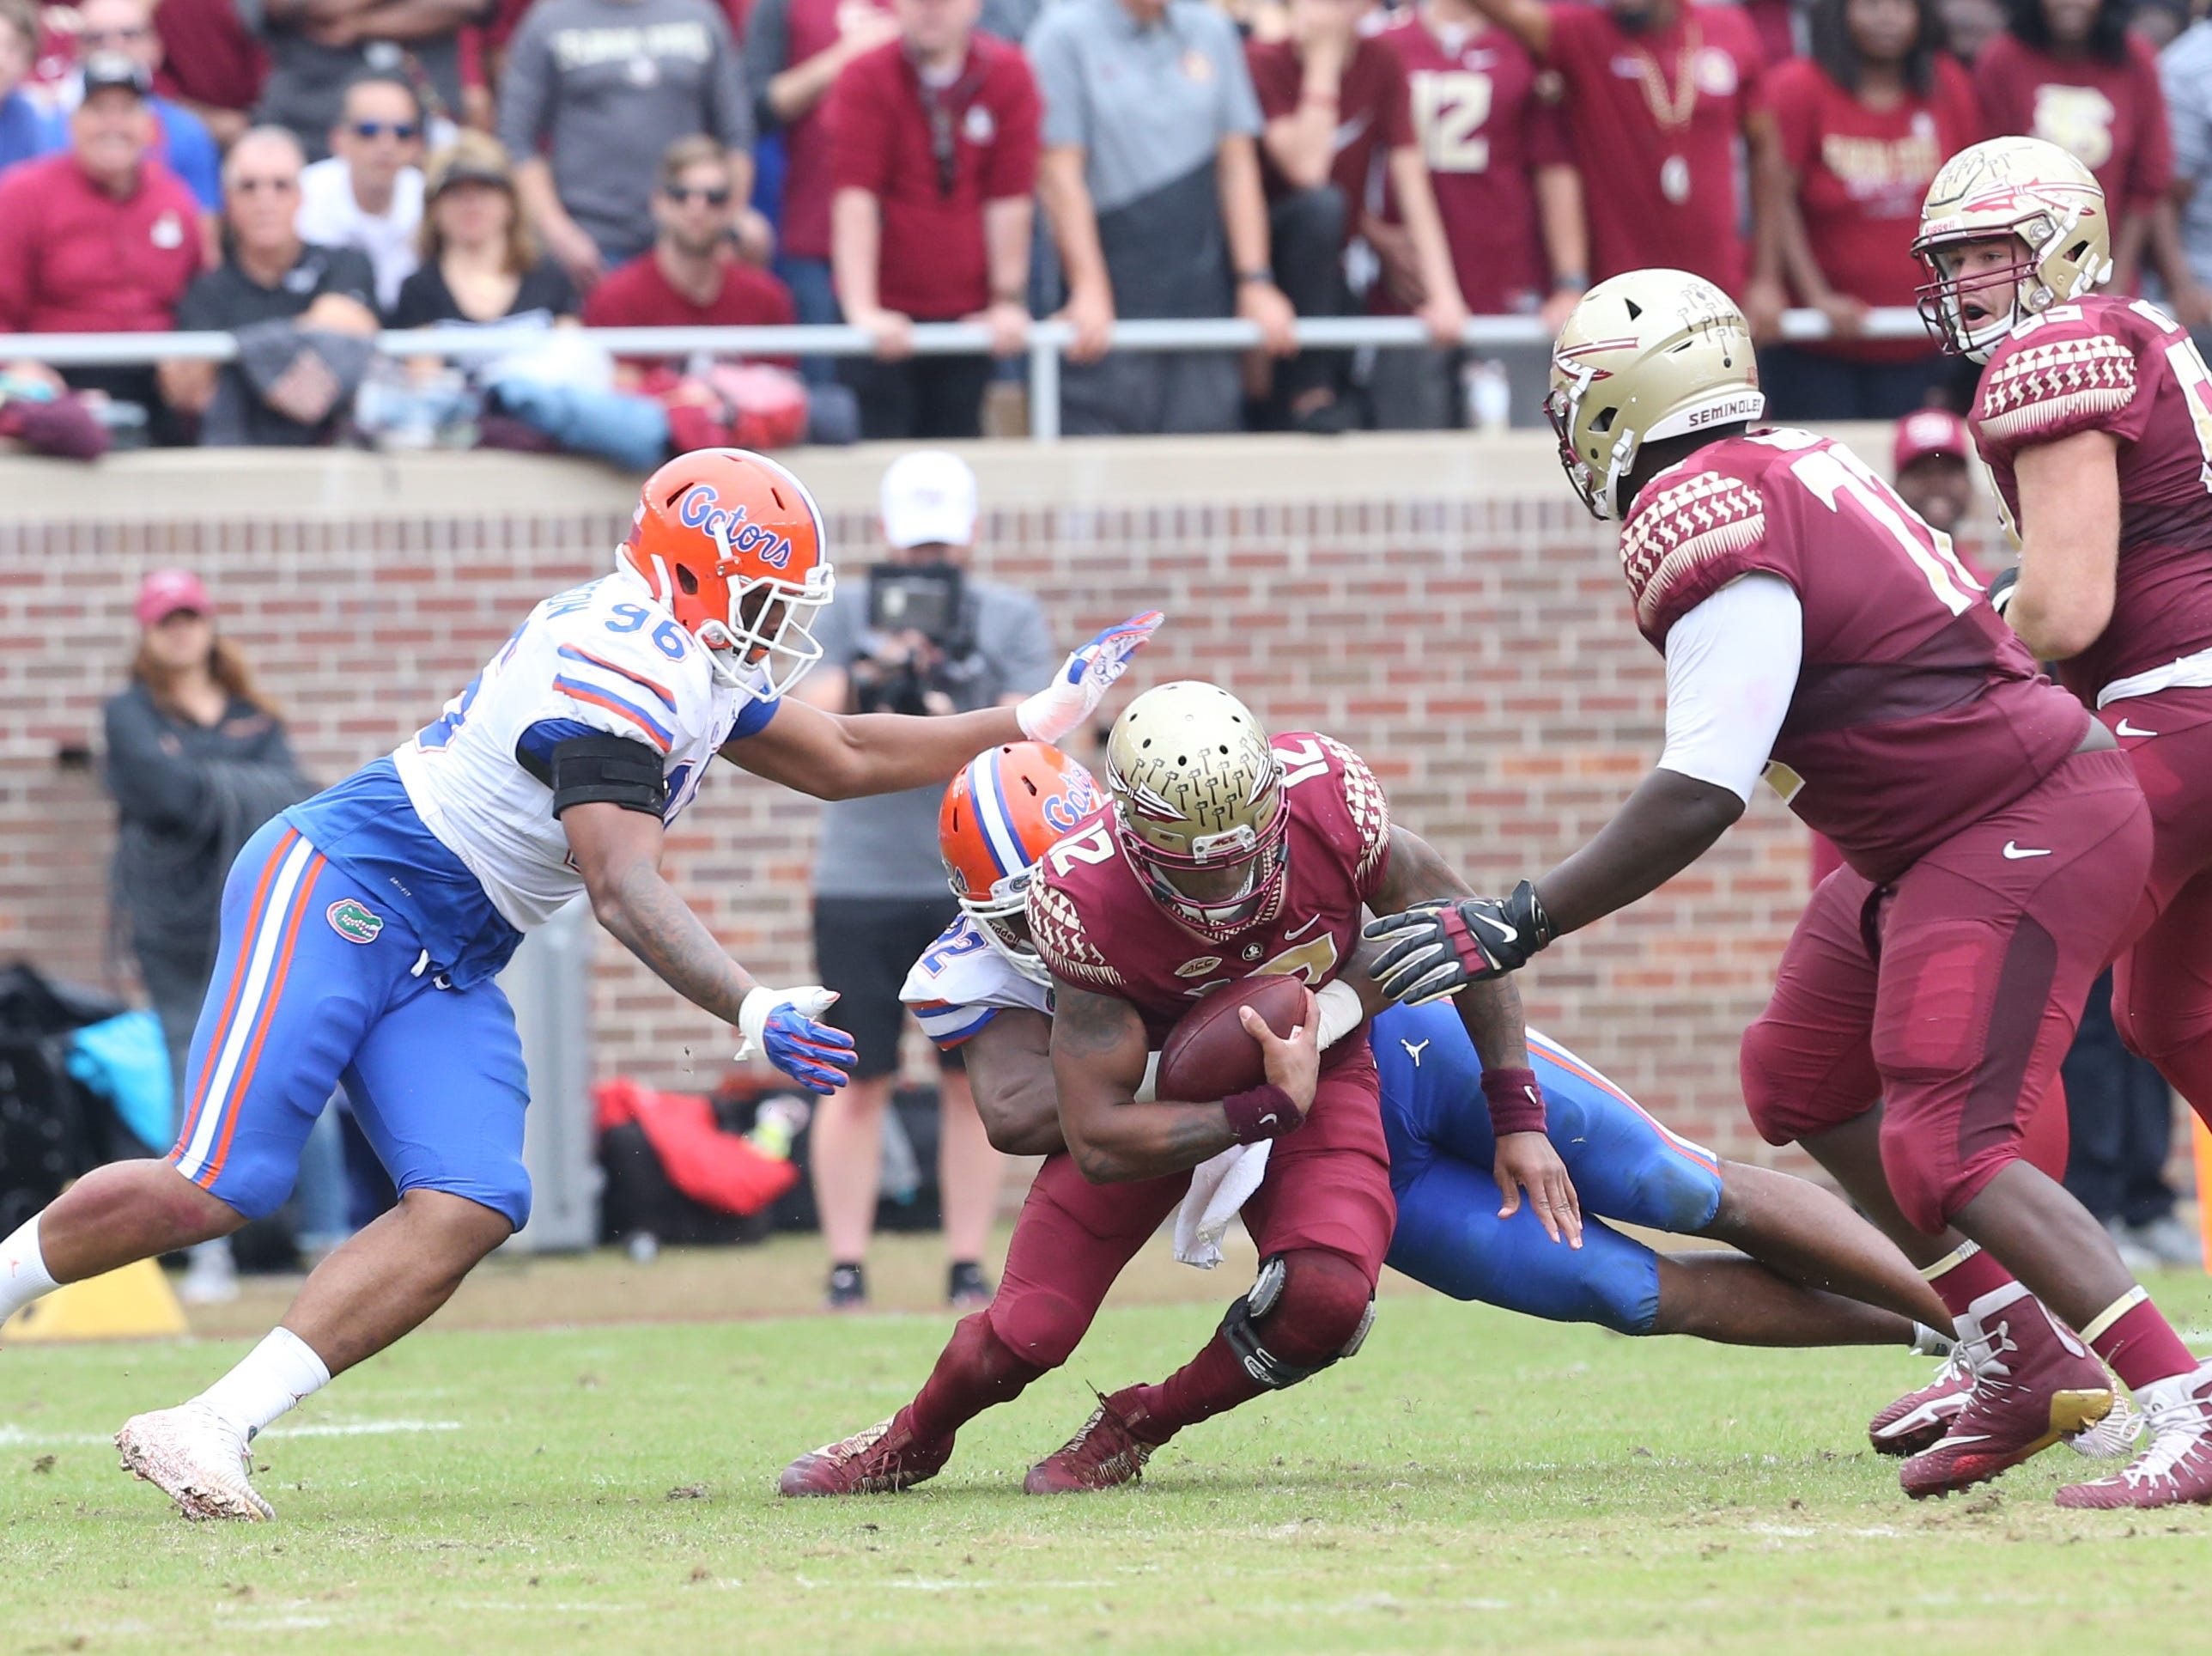 Florida State Seminoles quarterback Deondre Francois (12) gets tackled as the Florida State Seminoles take on their rival the Florida Gators in college football at Doak S. Campbell Stadium, Saturday, Nov. 24, 2018.